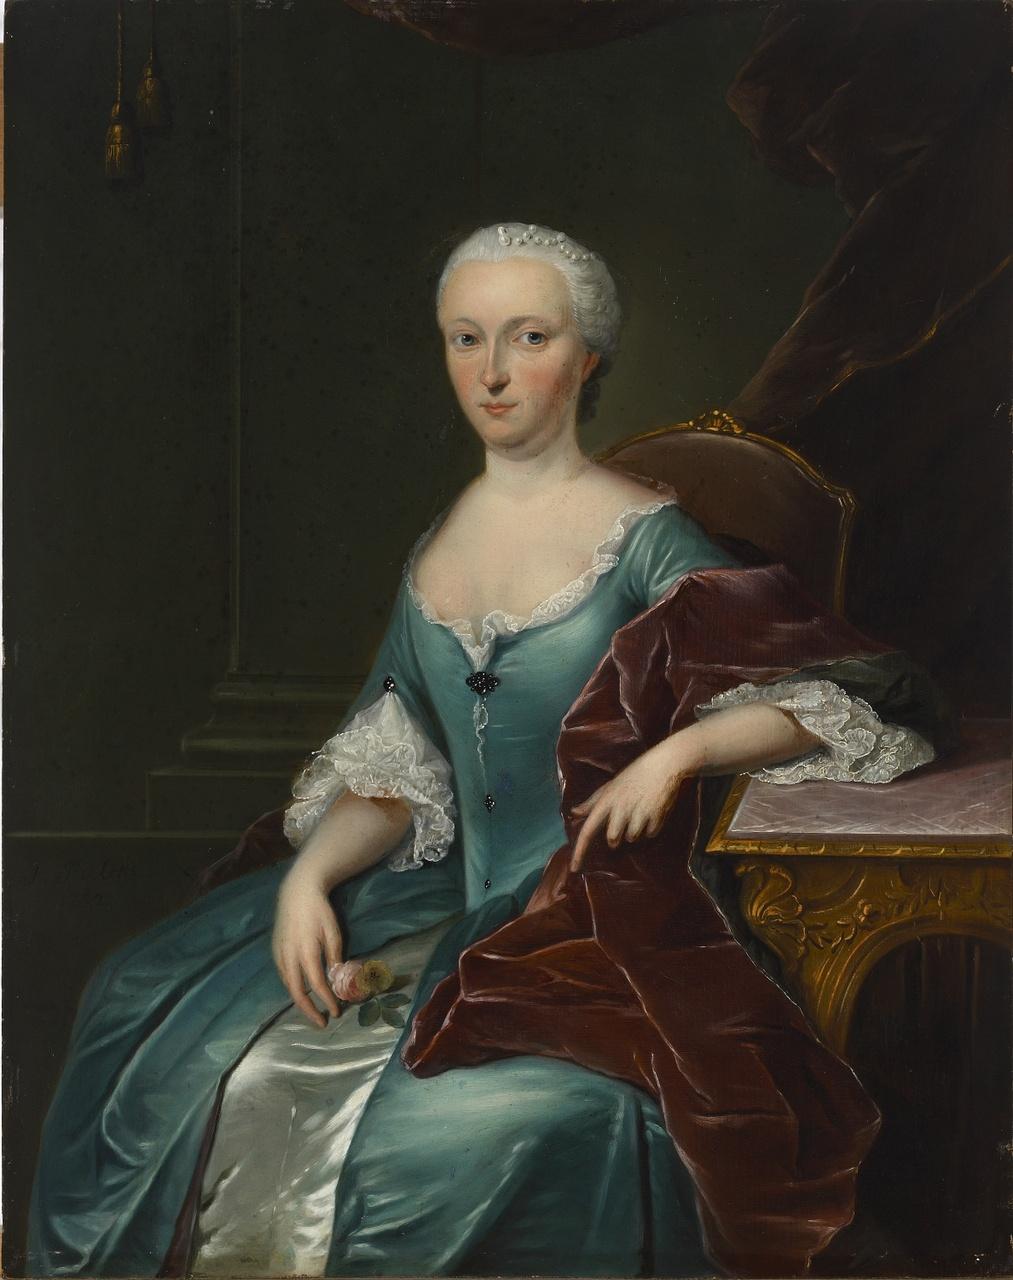 Anna Christina de Bye (1718-1760), Jan Palthe